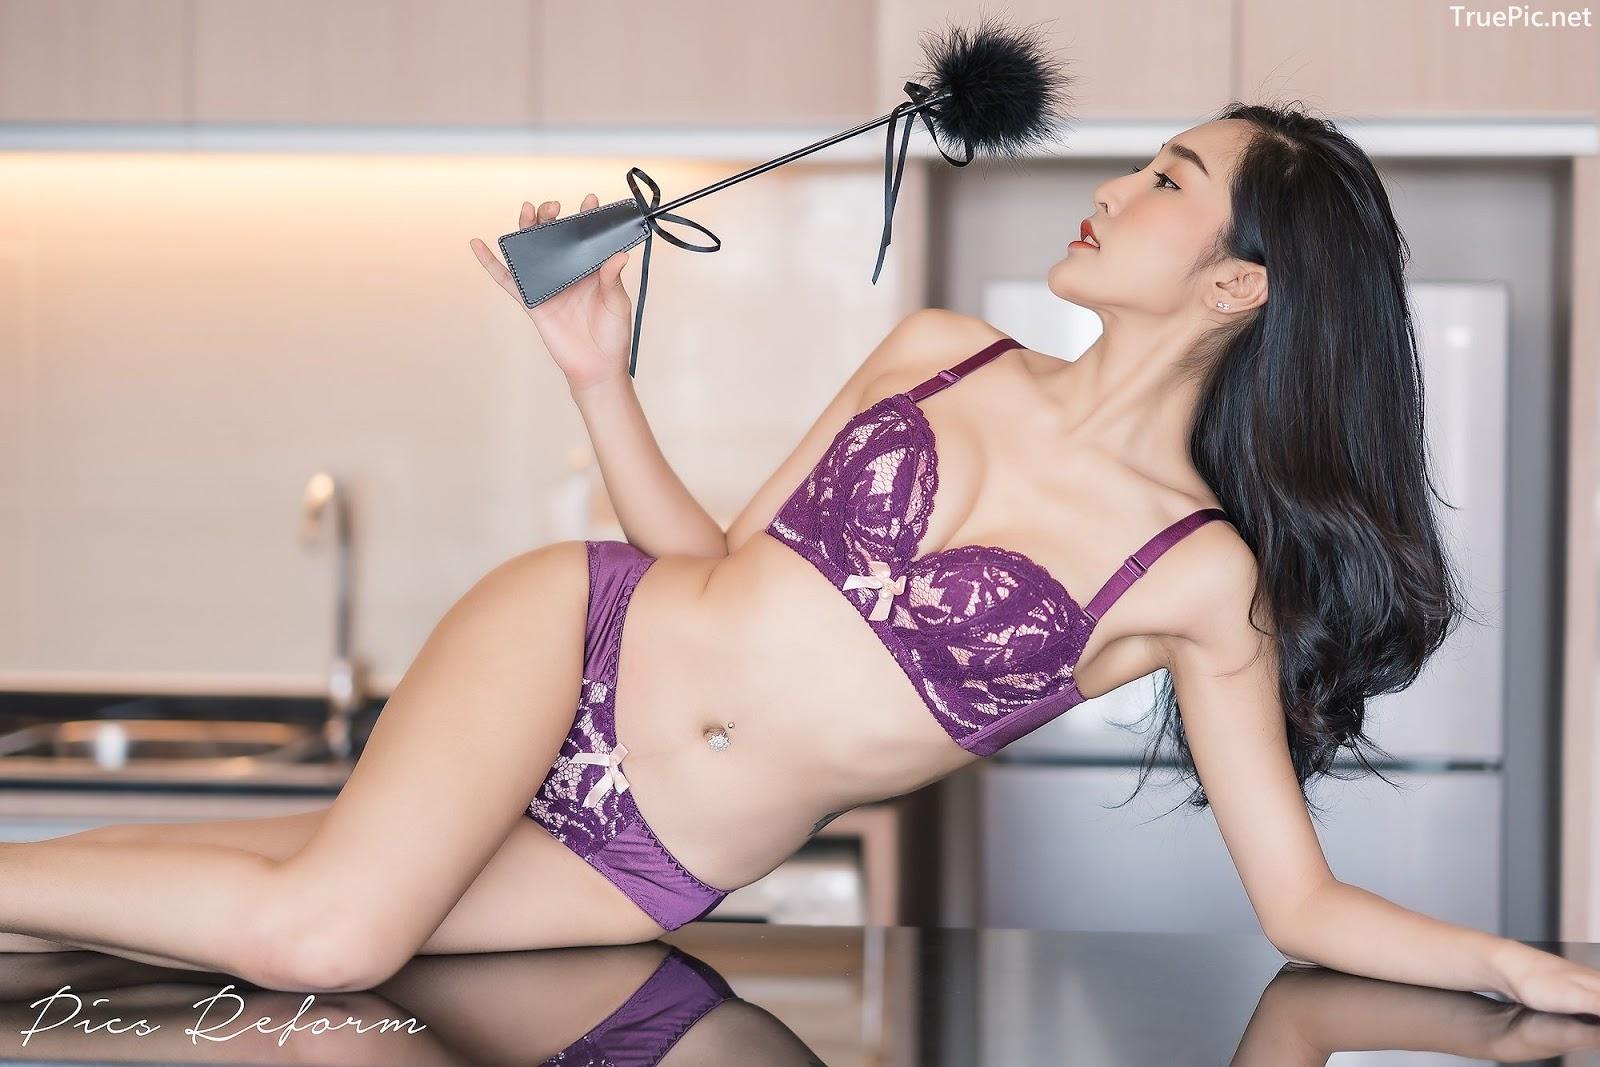 Image-Thailand-Sexy-Model-Yanapat-Ukkararujipat-Violet-Girl-TruePic.net- Picture-2